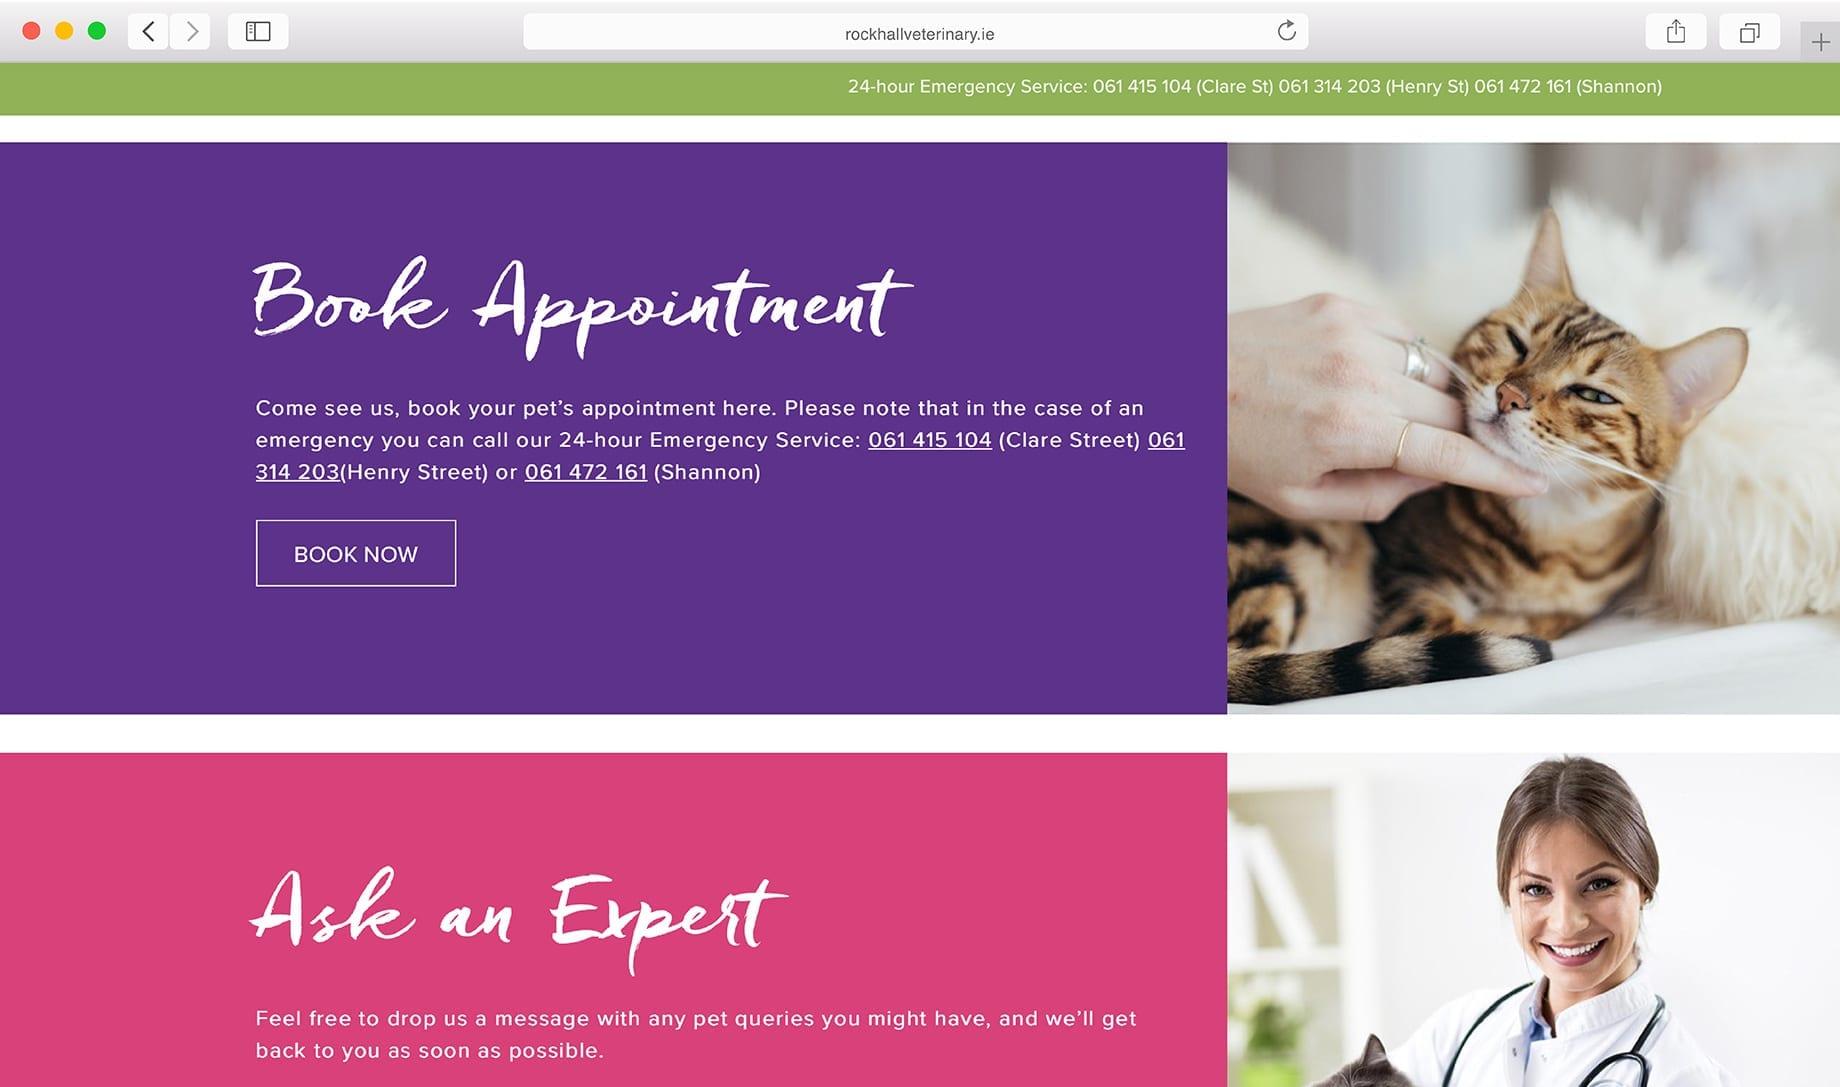 Rockhall Vets Web Design Company